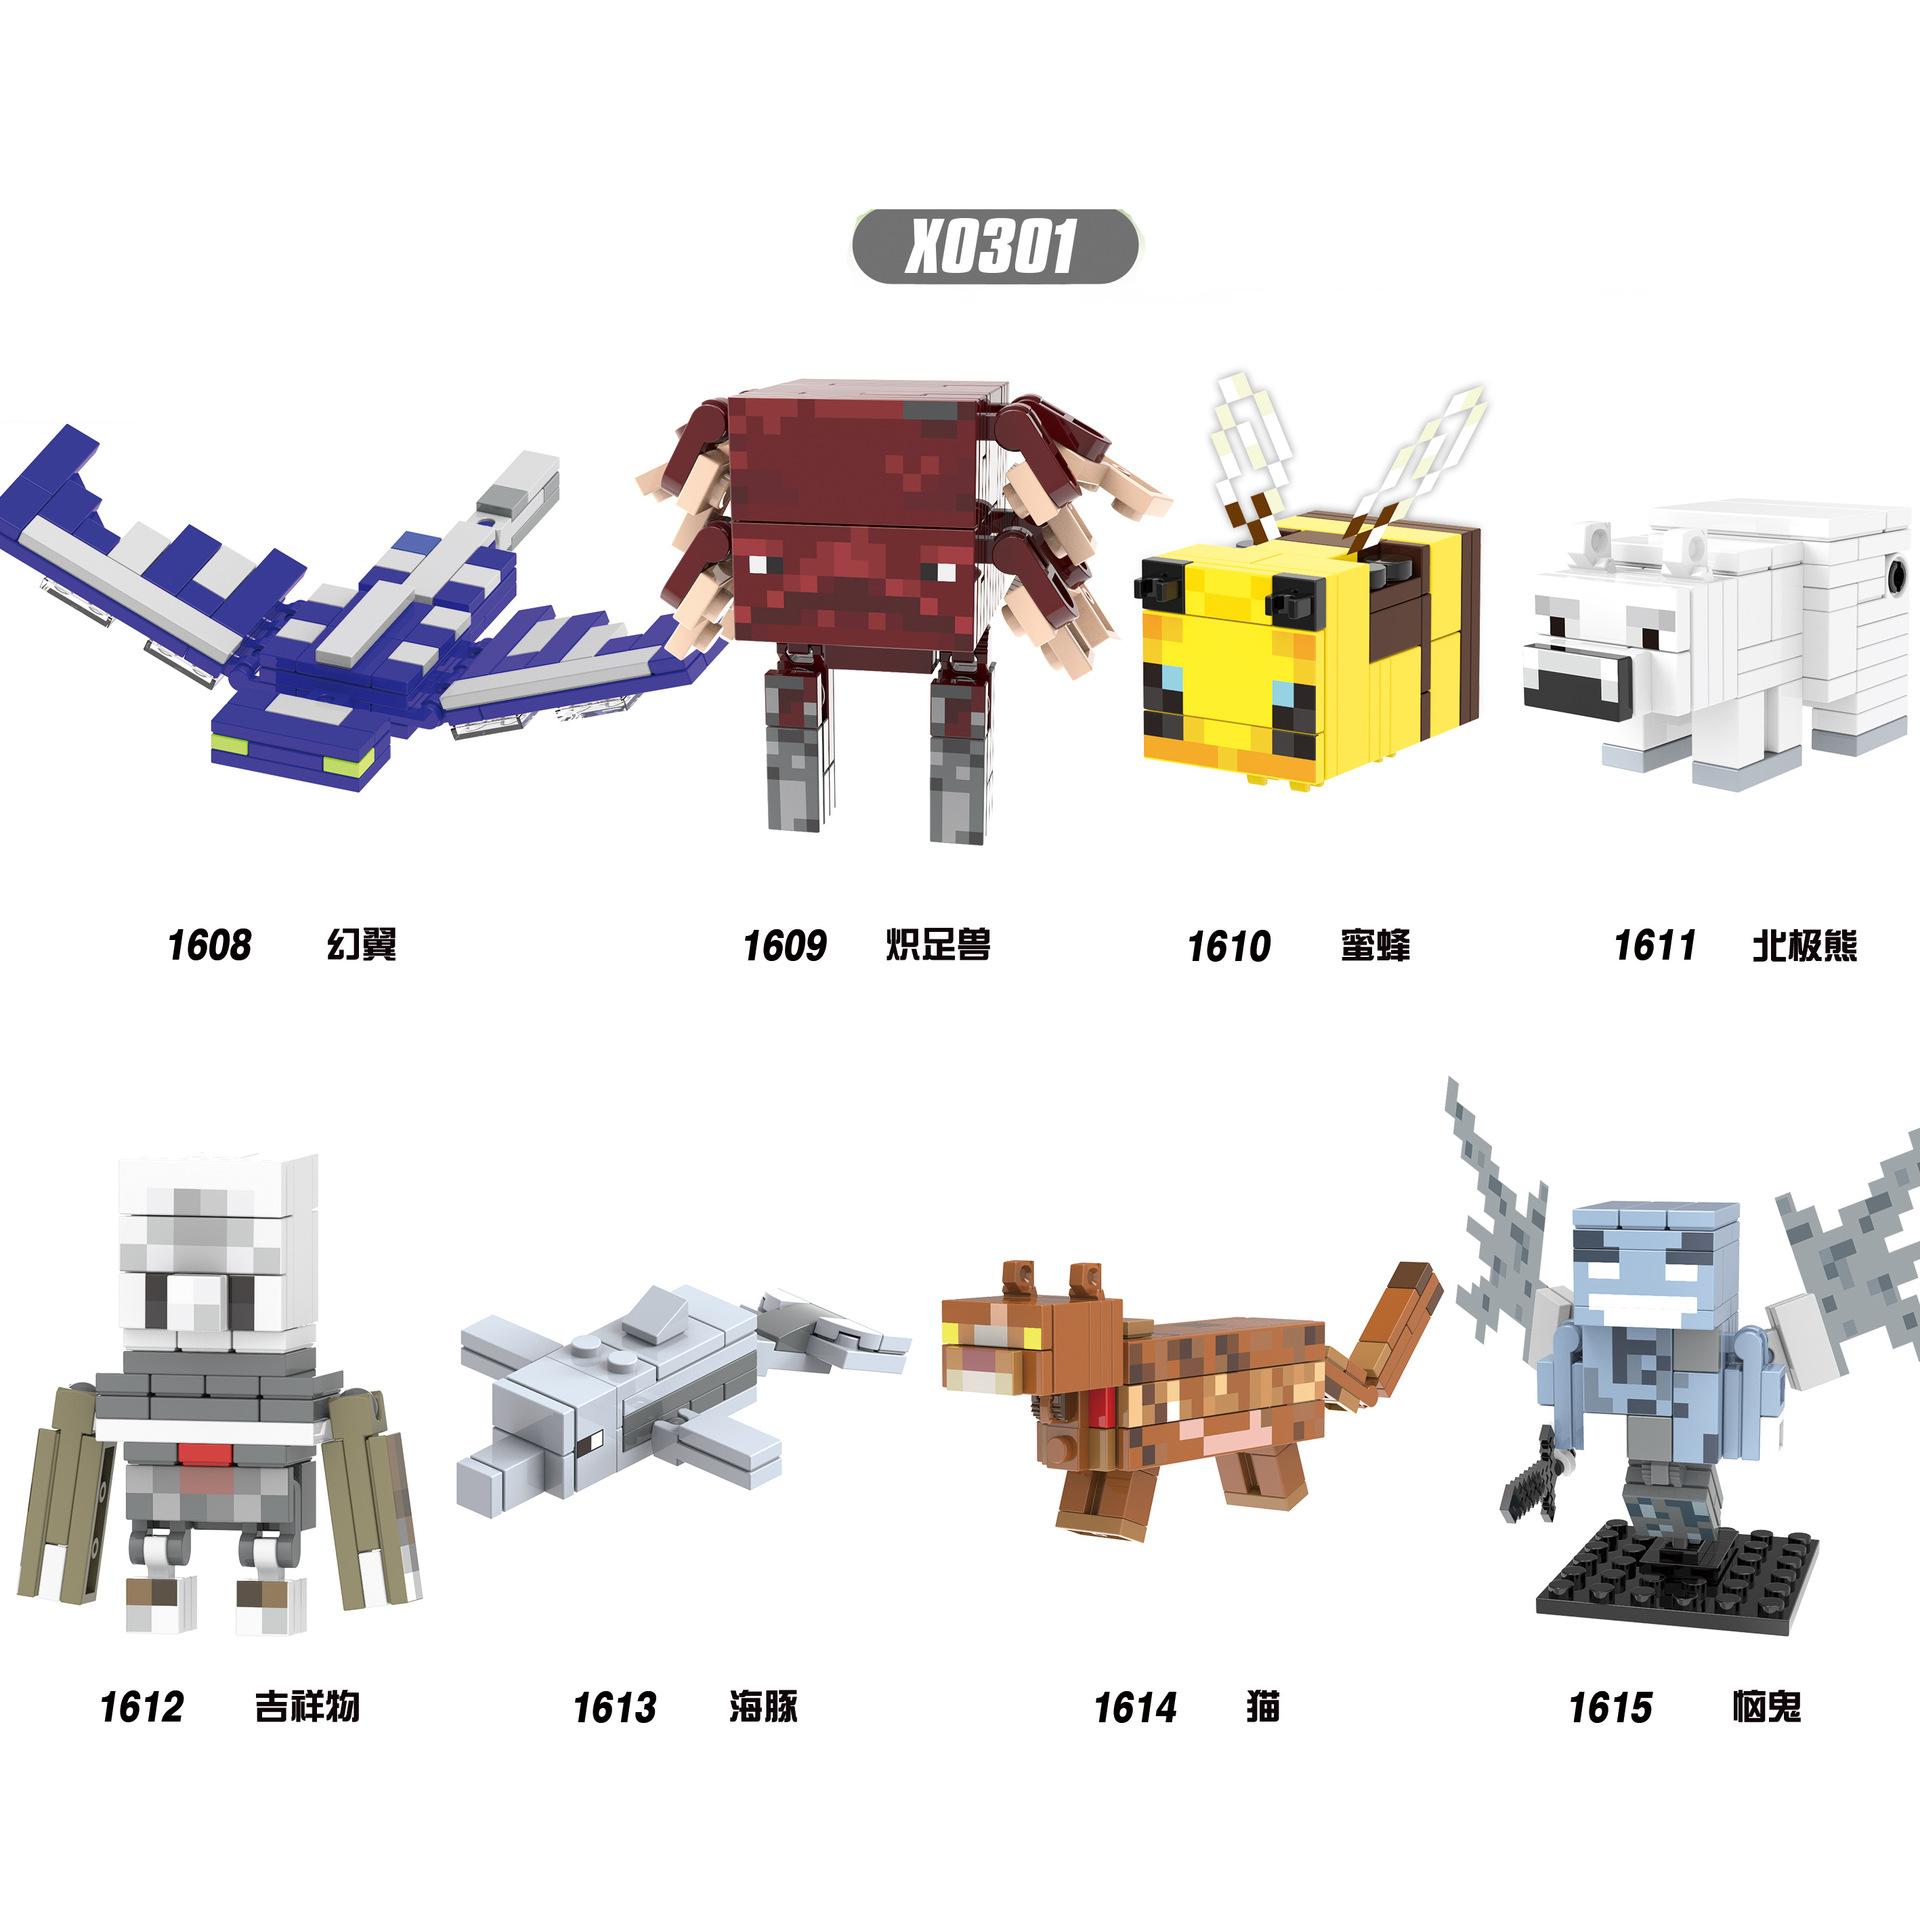 【Ready Stock】Minecraft Building Blocks Lego Toys Characters Figure Phantom Strider Polar Bear Agent Vex Cat Dolphin Toy For Boy Kids Gift